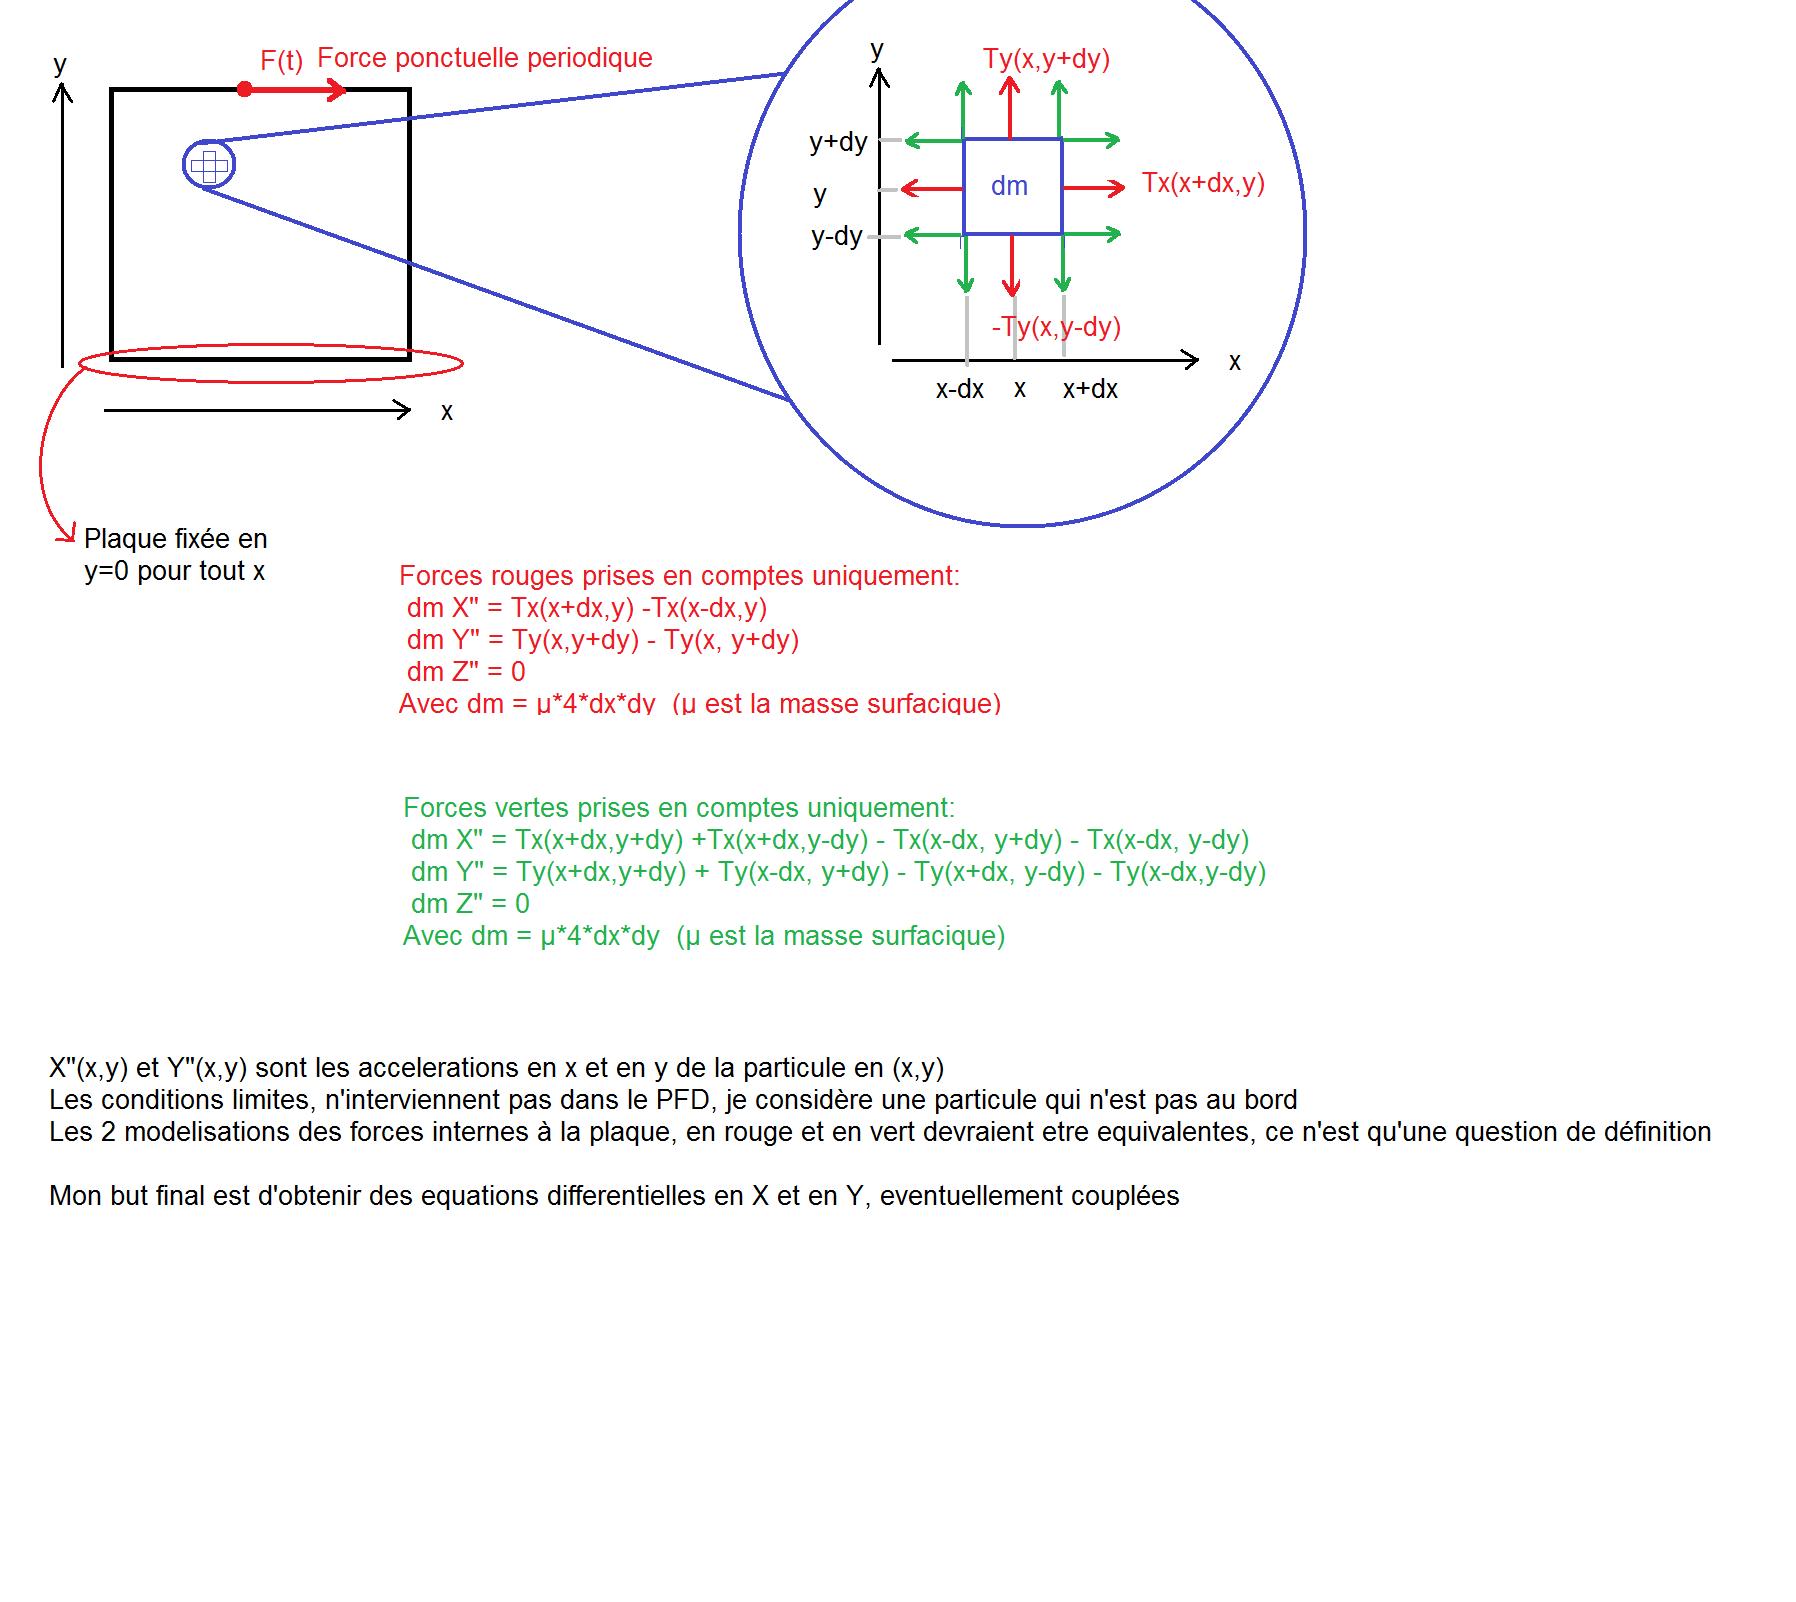 https://image.noelshack.com/fichiers/2017/49/3-1512591715-ddq.png